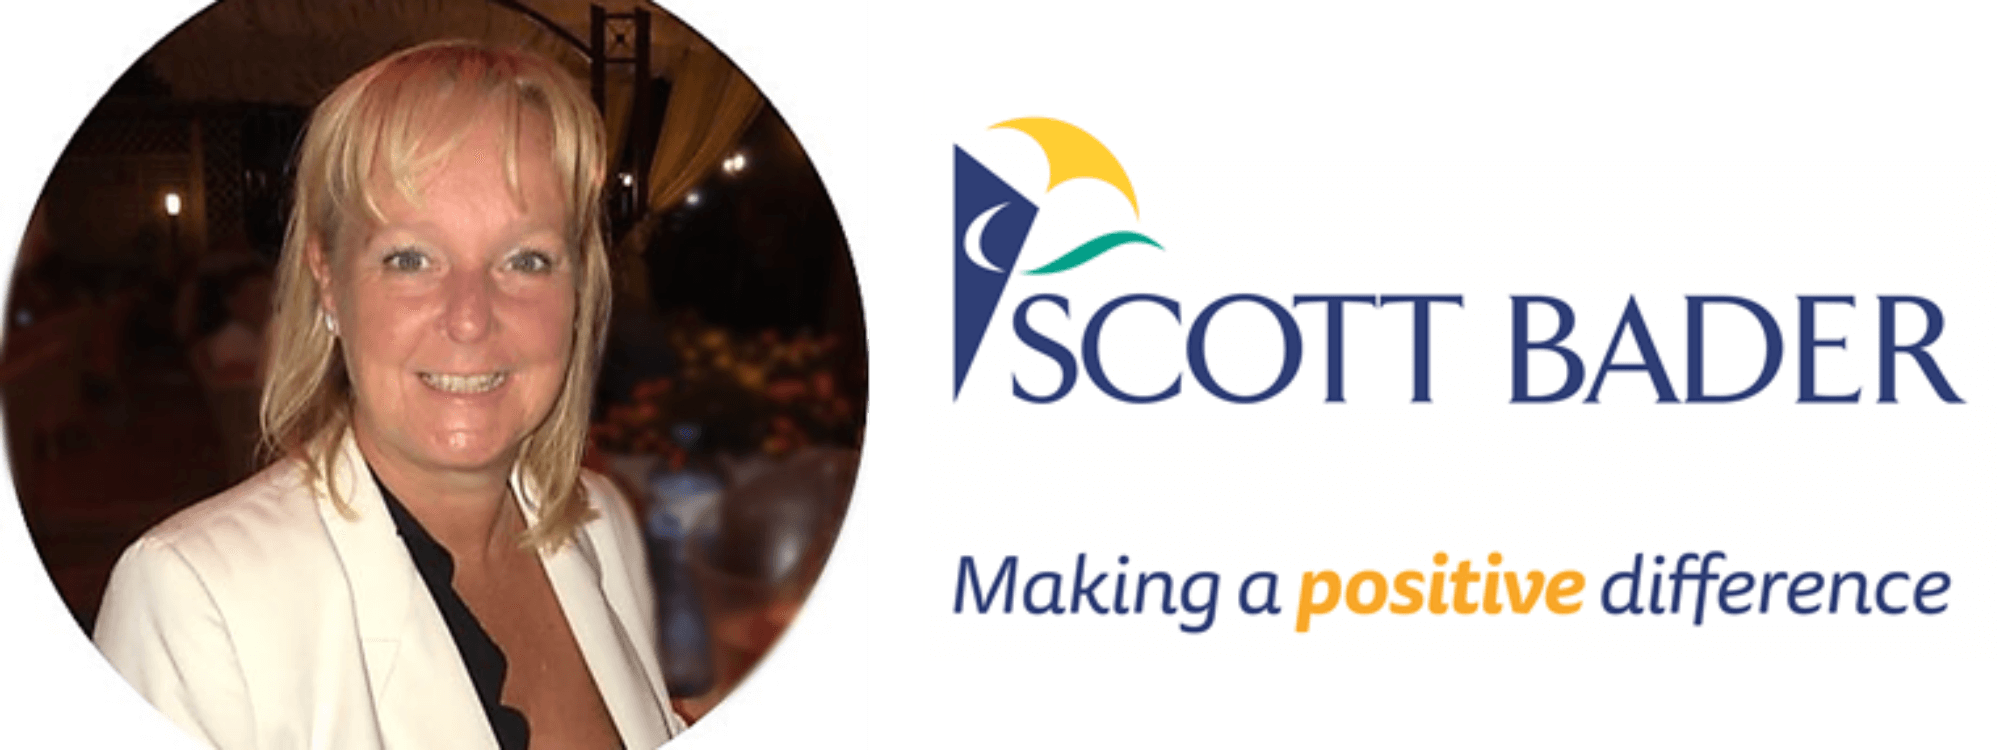 The Scott Bader Group Board appoints Dianne Walker as Senior Independent Director